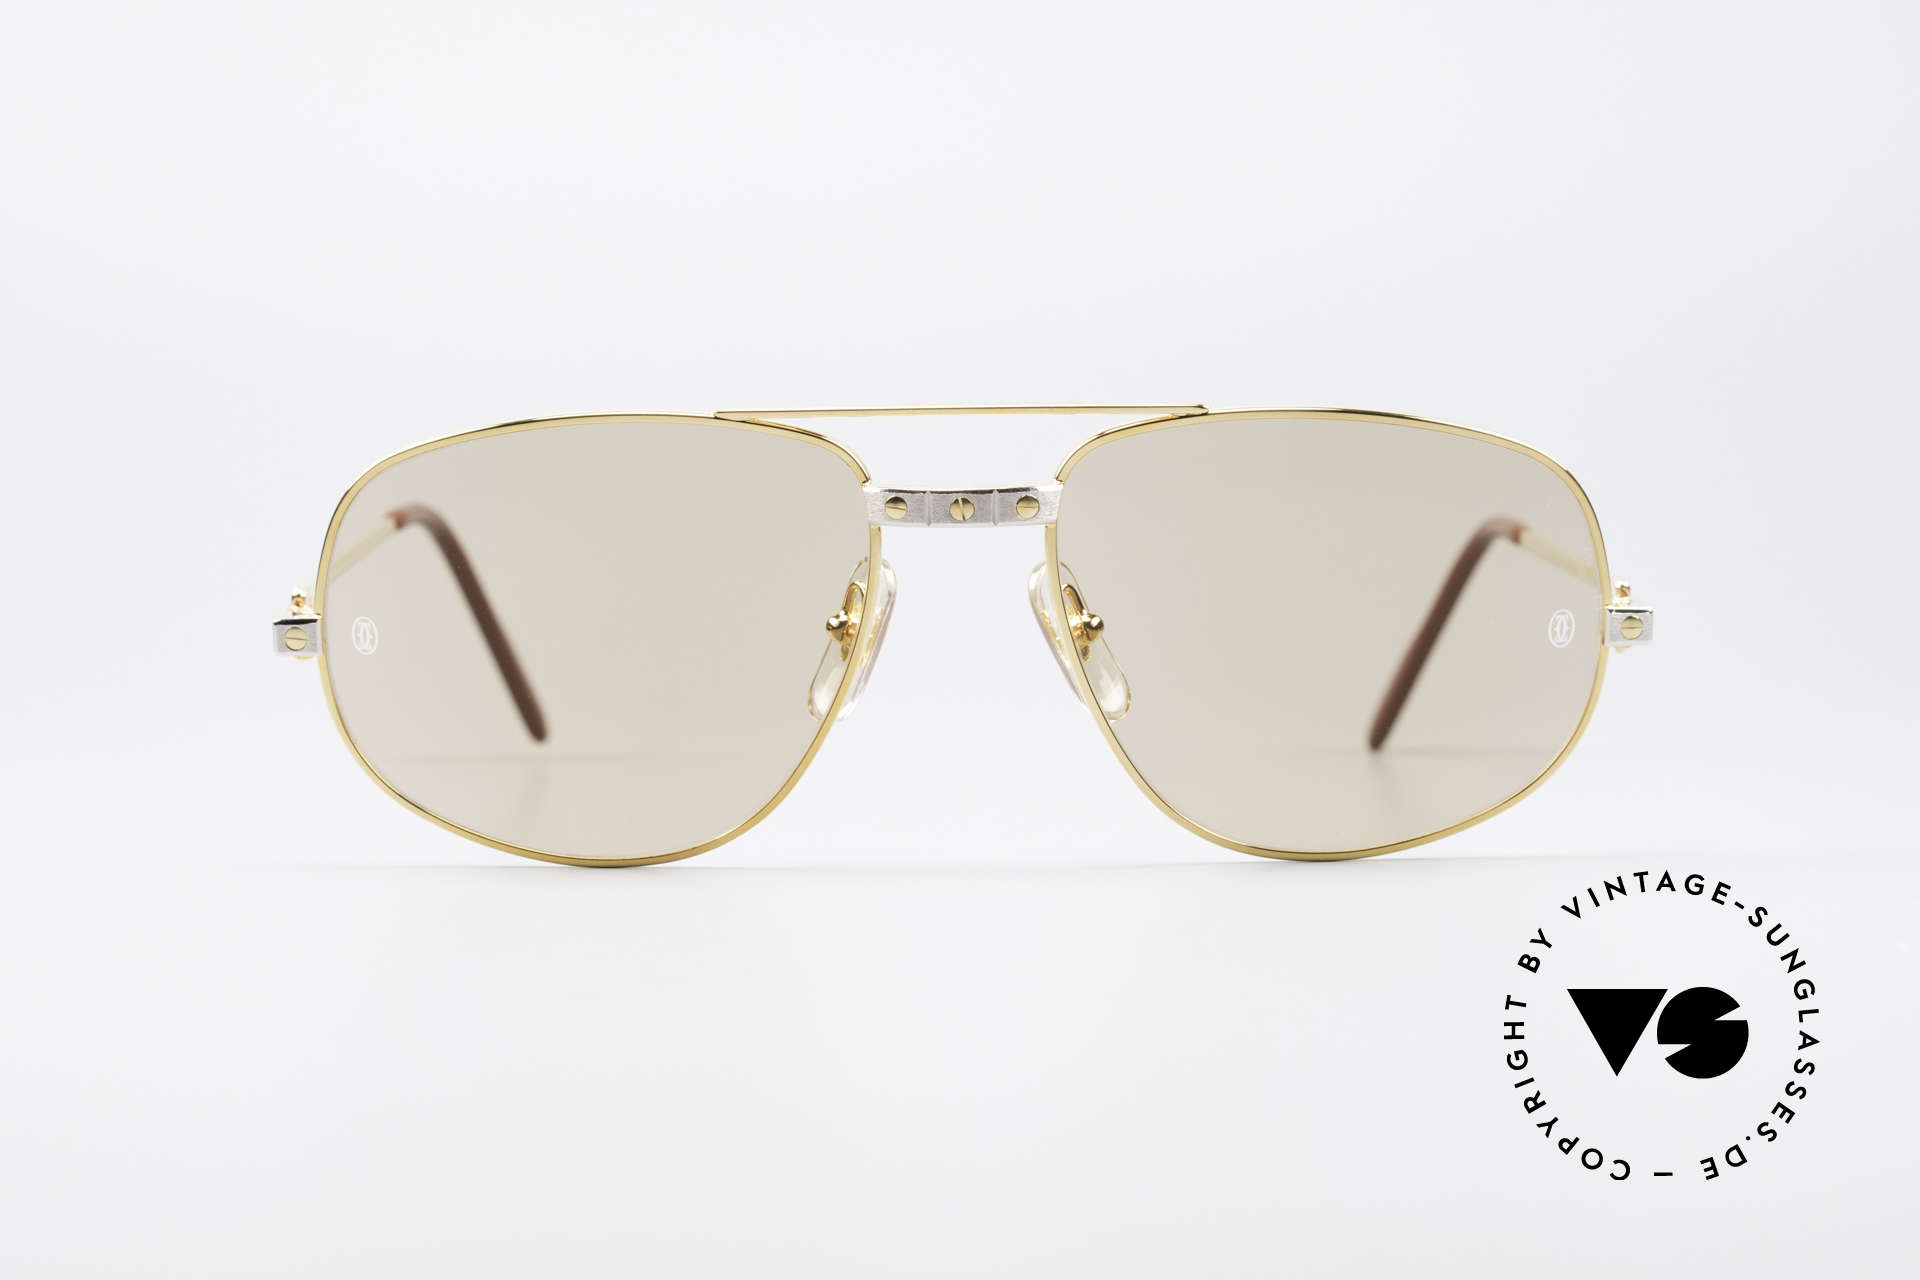 a5f22fb2b8c8 Sunglasses Cartier Romance Santos - L Luxury Shades